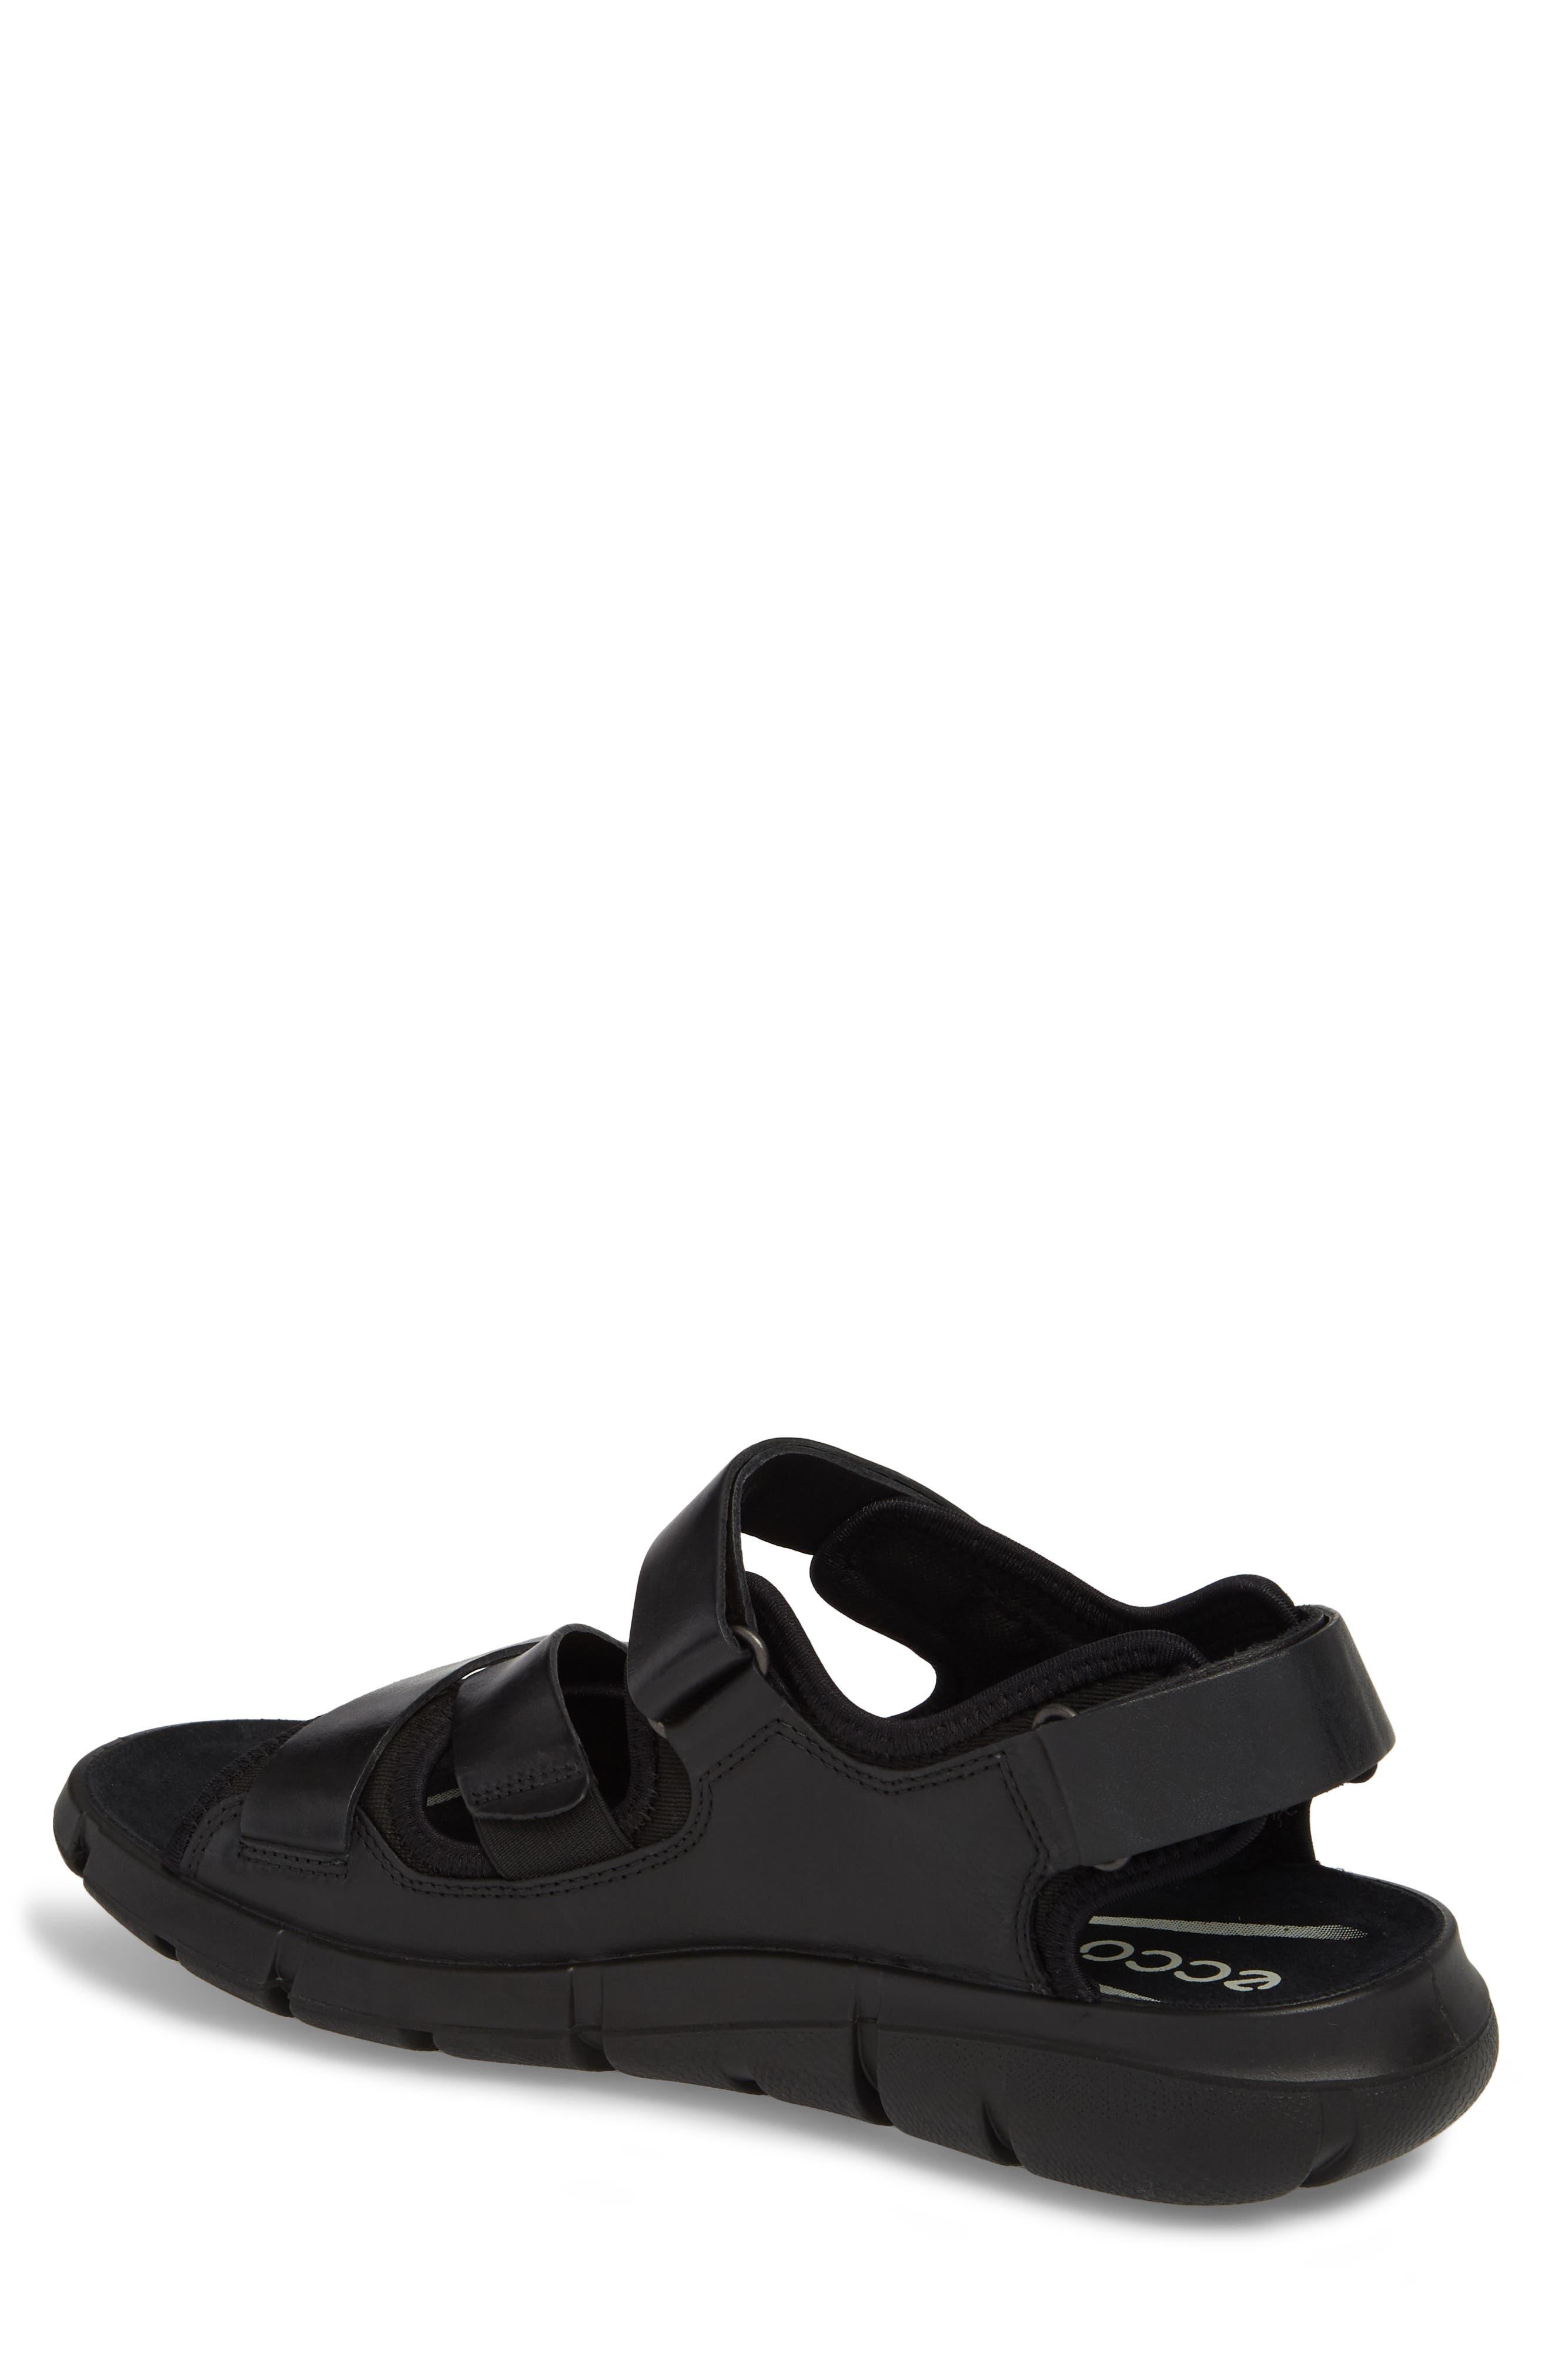 Intrinsic 2 Sandal,                             Alternate thumbnail 2, color,                             Black Leather